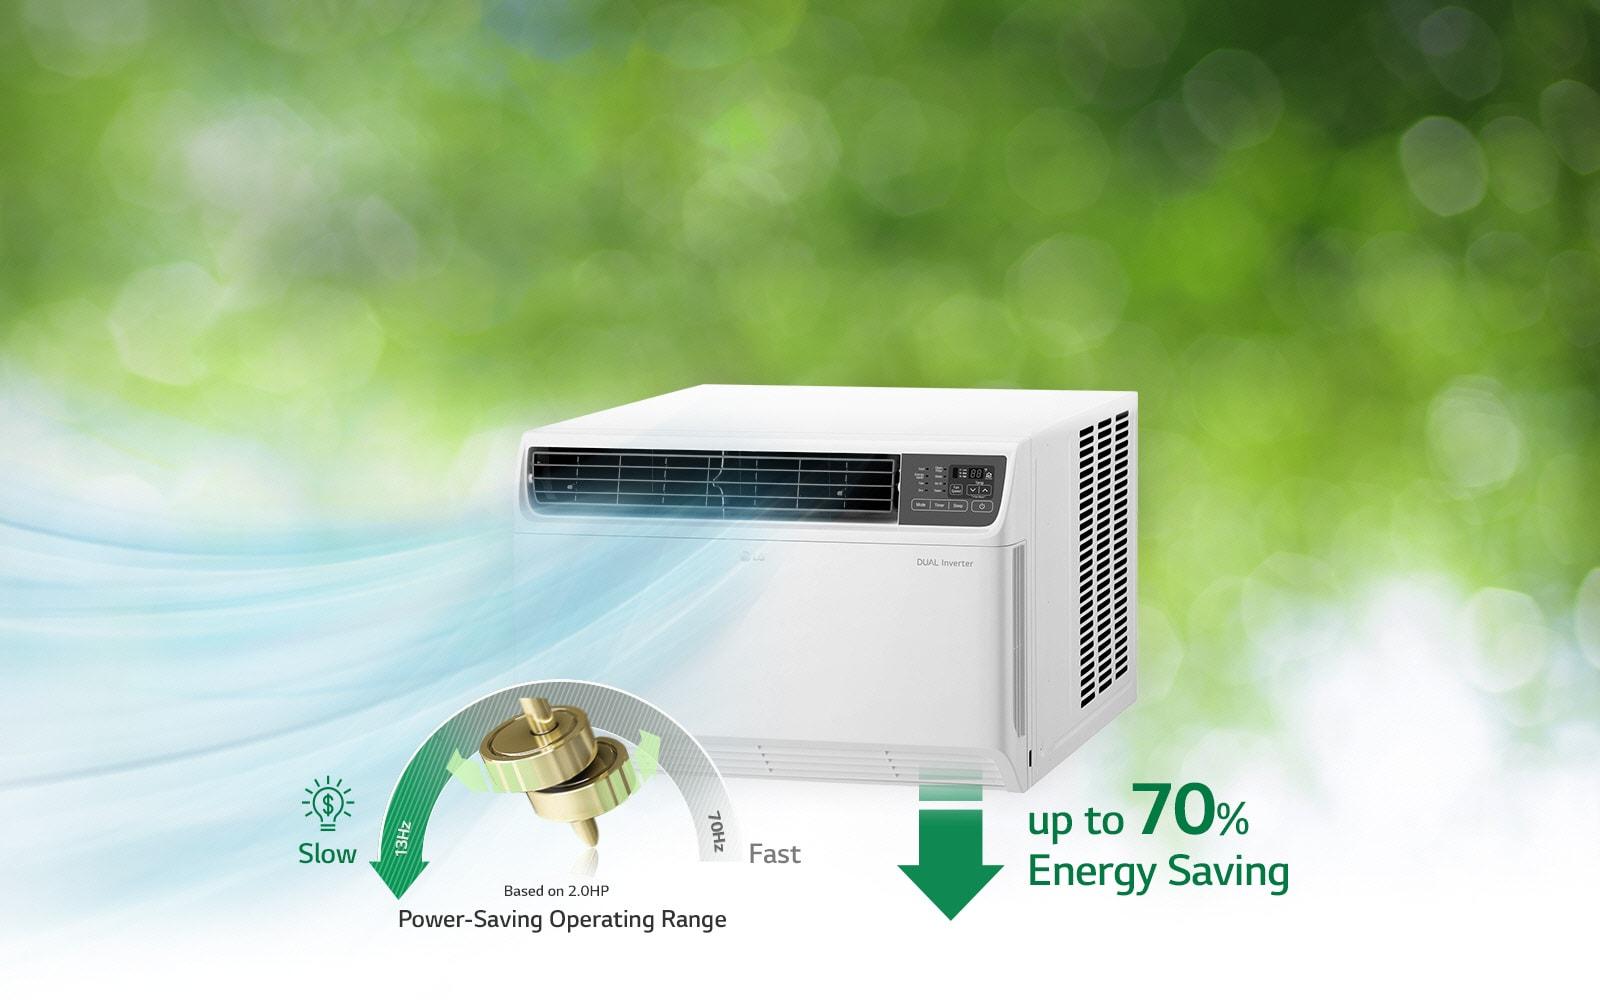 LG  75 HP, Dual Inverter Compressor, 70% Energy Saving, Anti